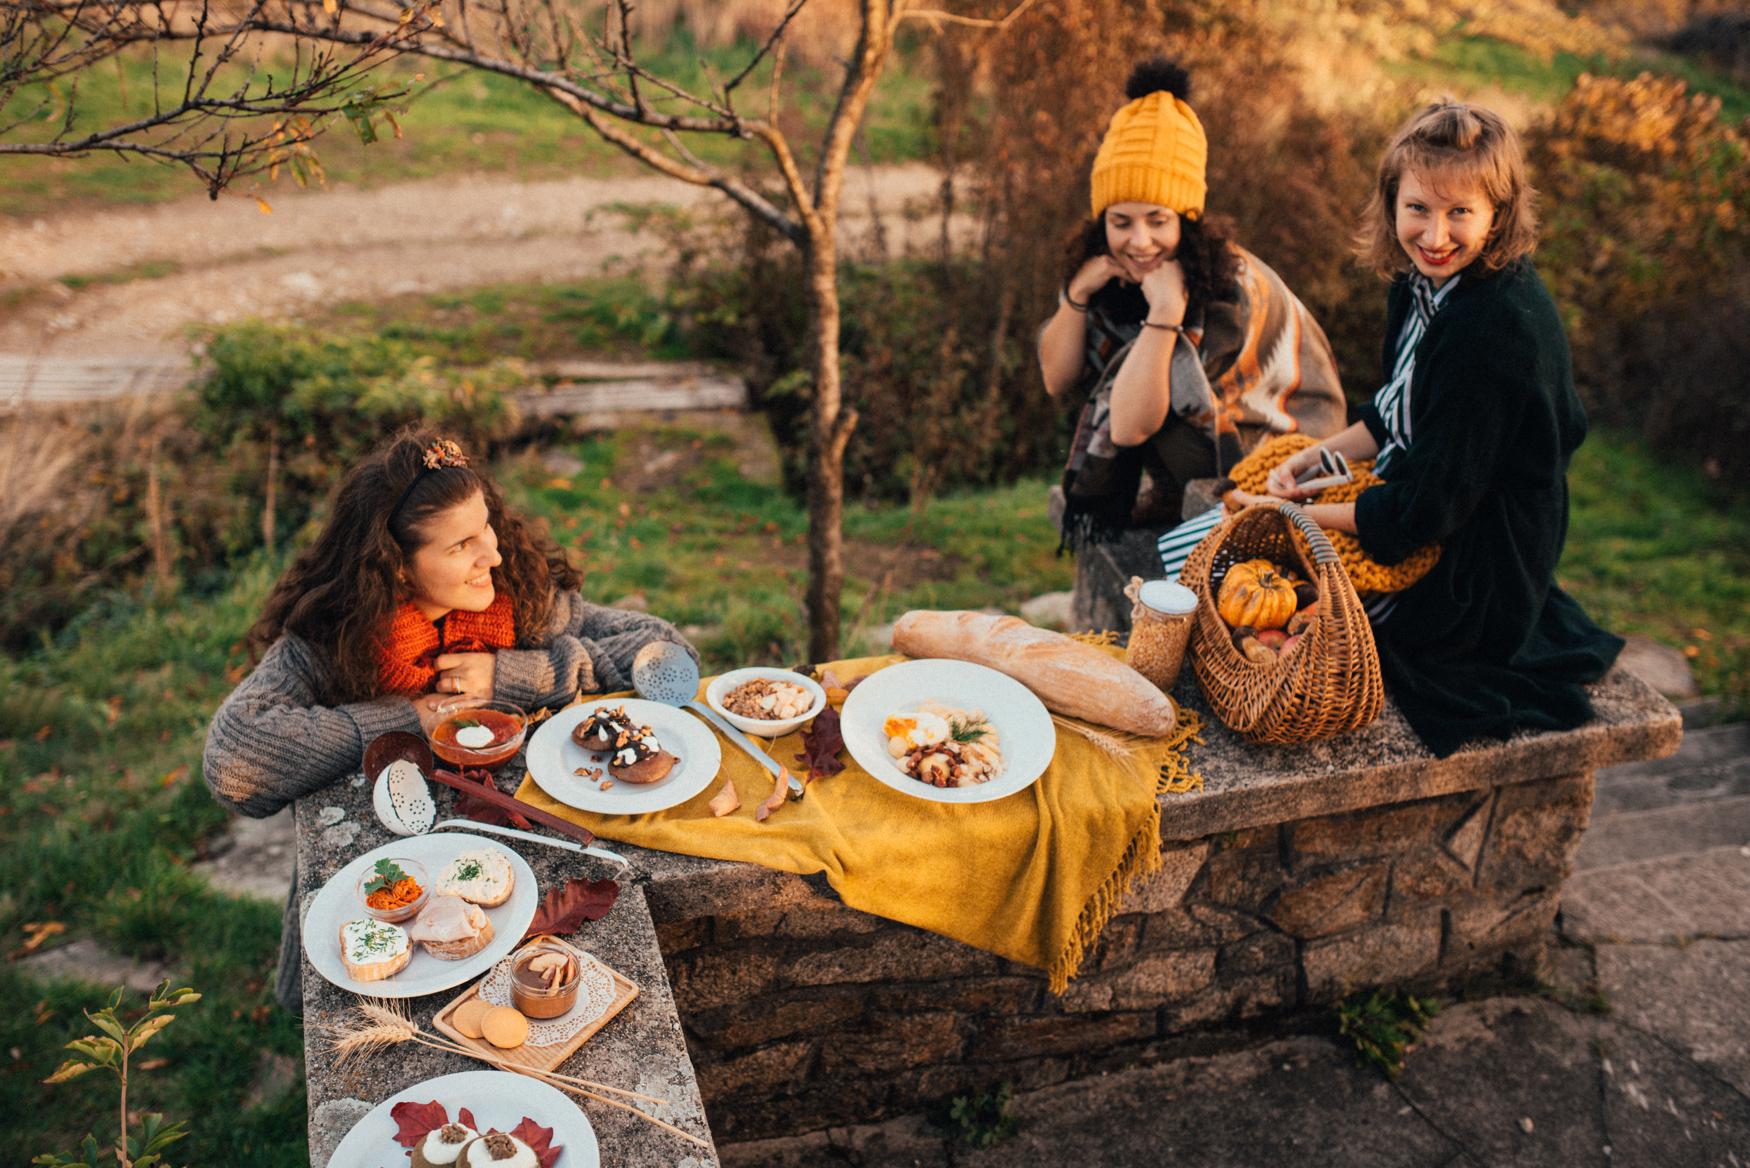 foodblog lifestyle photographer zufana 022.jpg